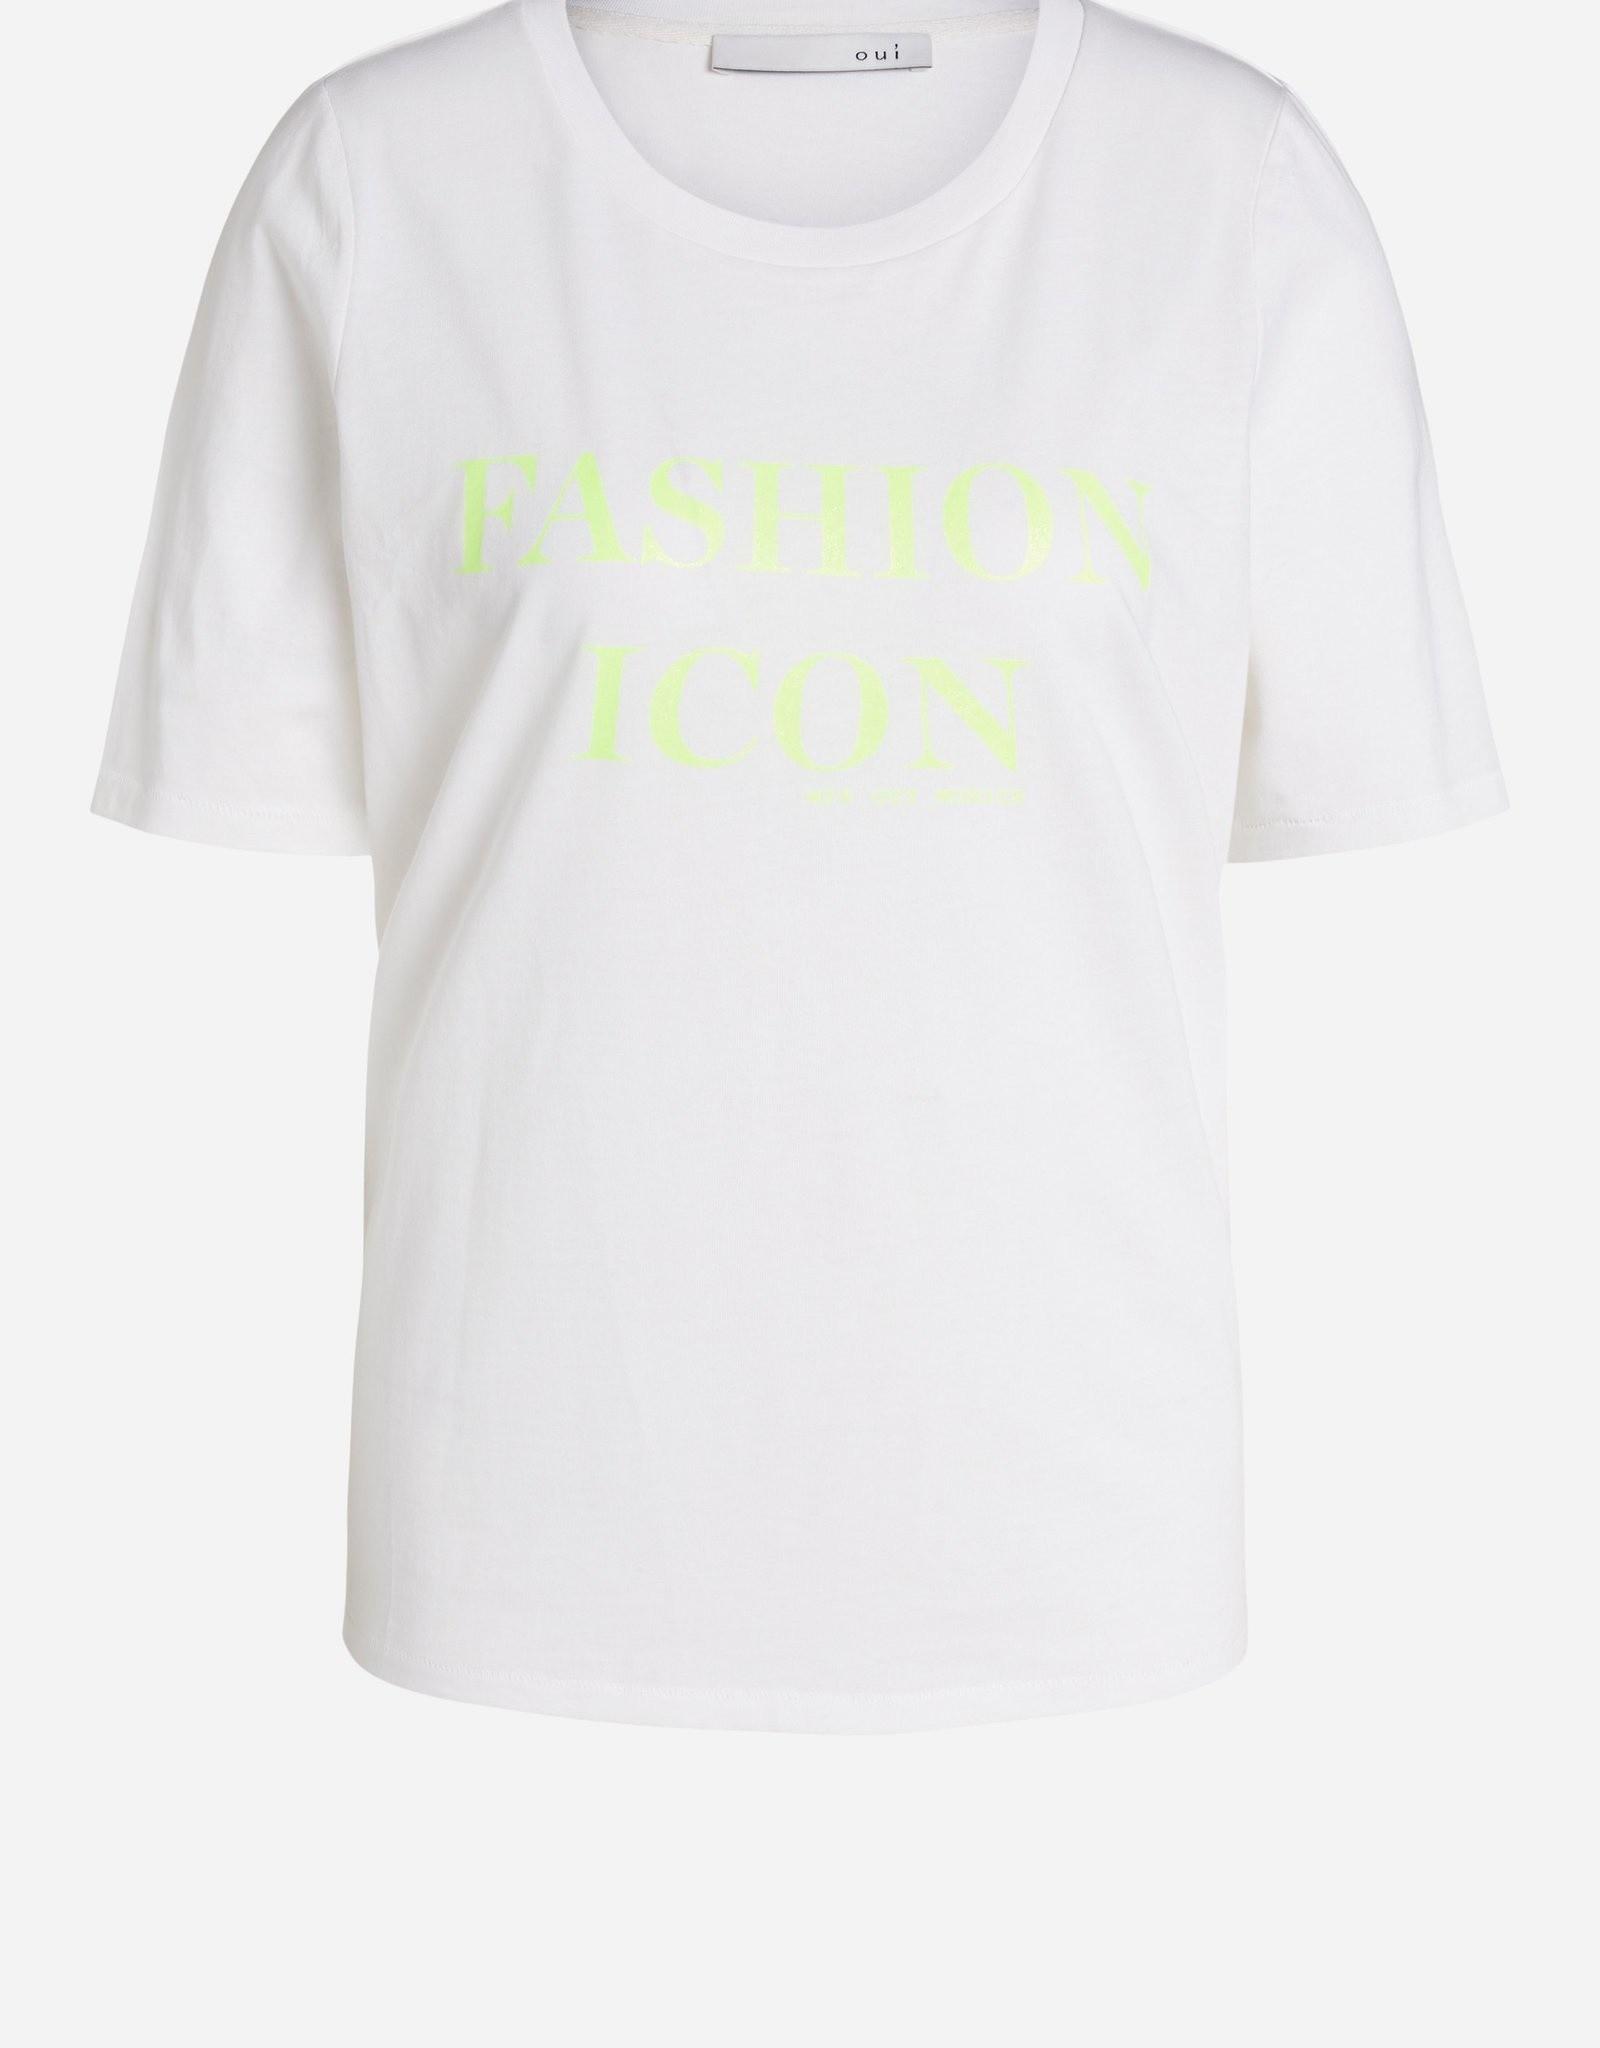 Ouí 71358 T-Shirt Fashion Icon